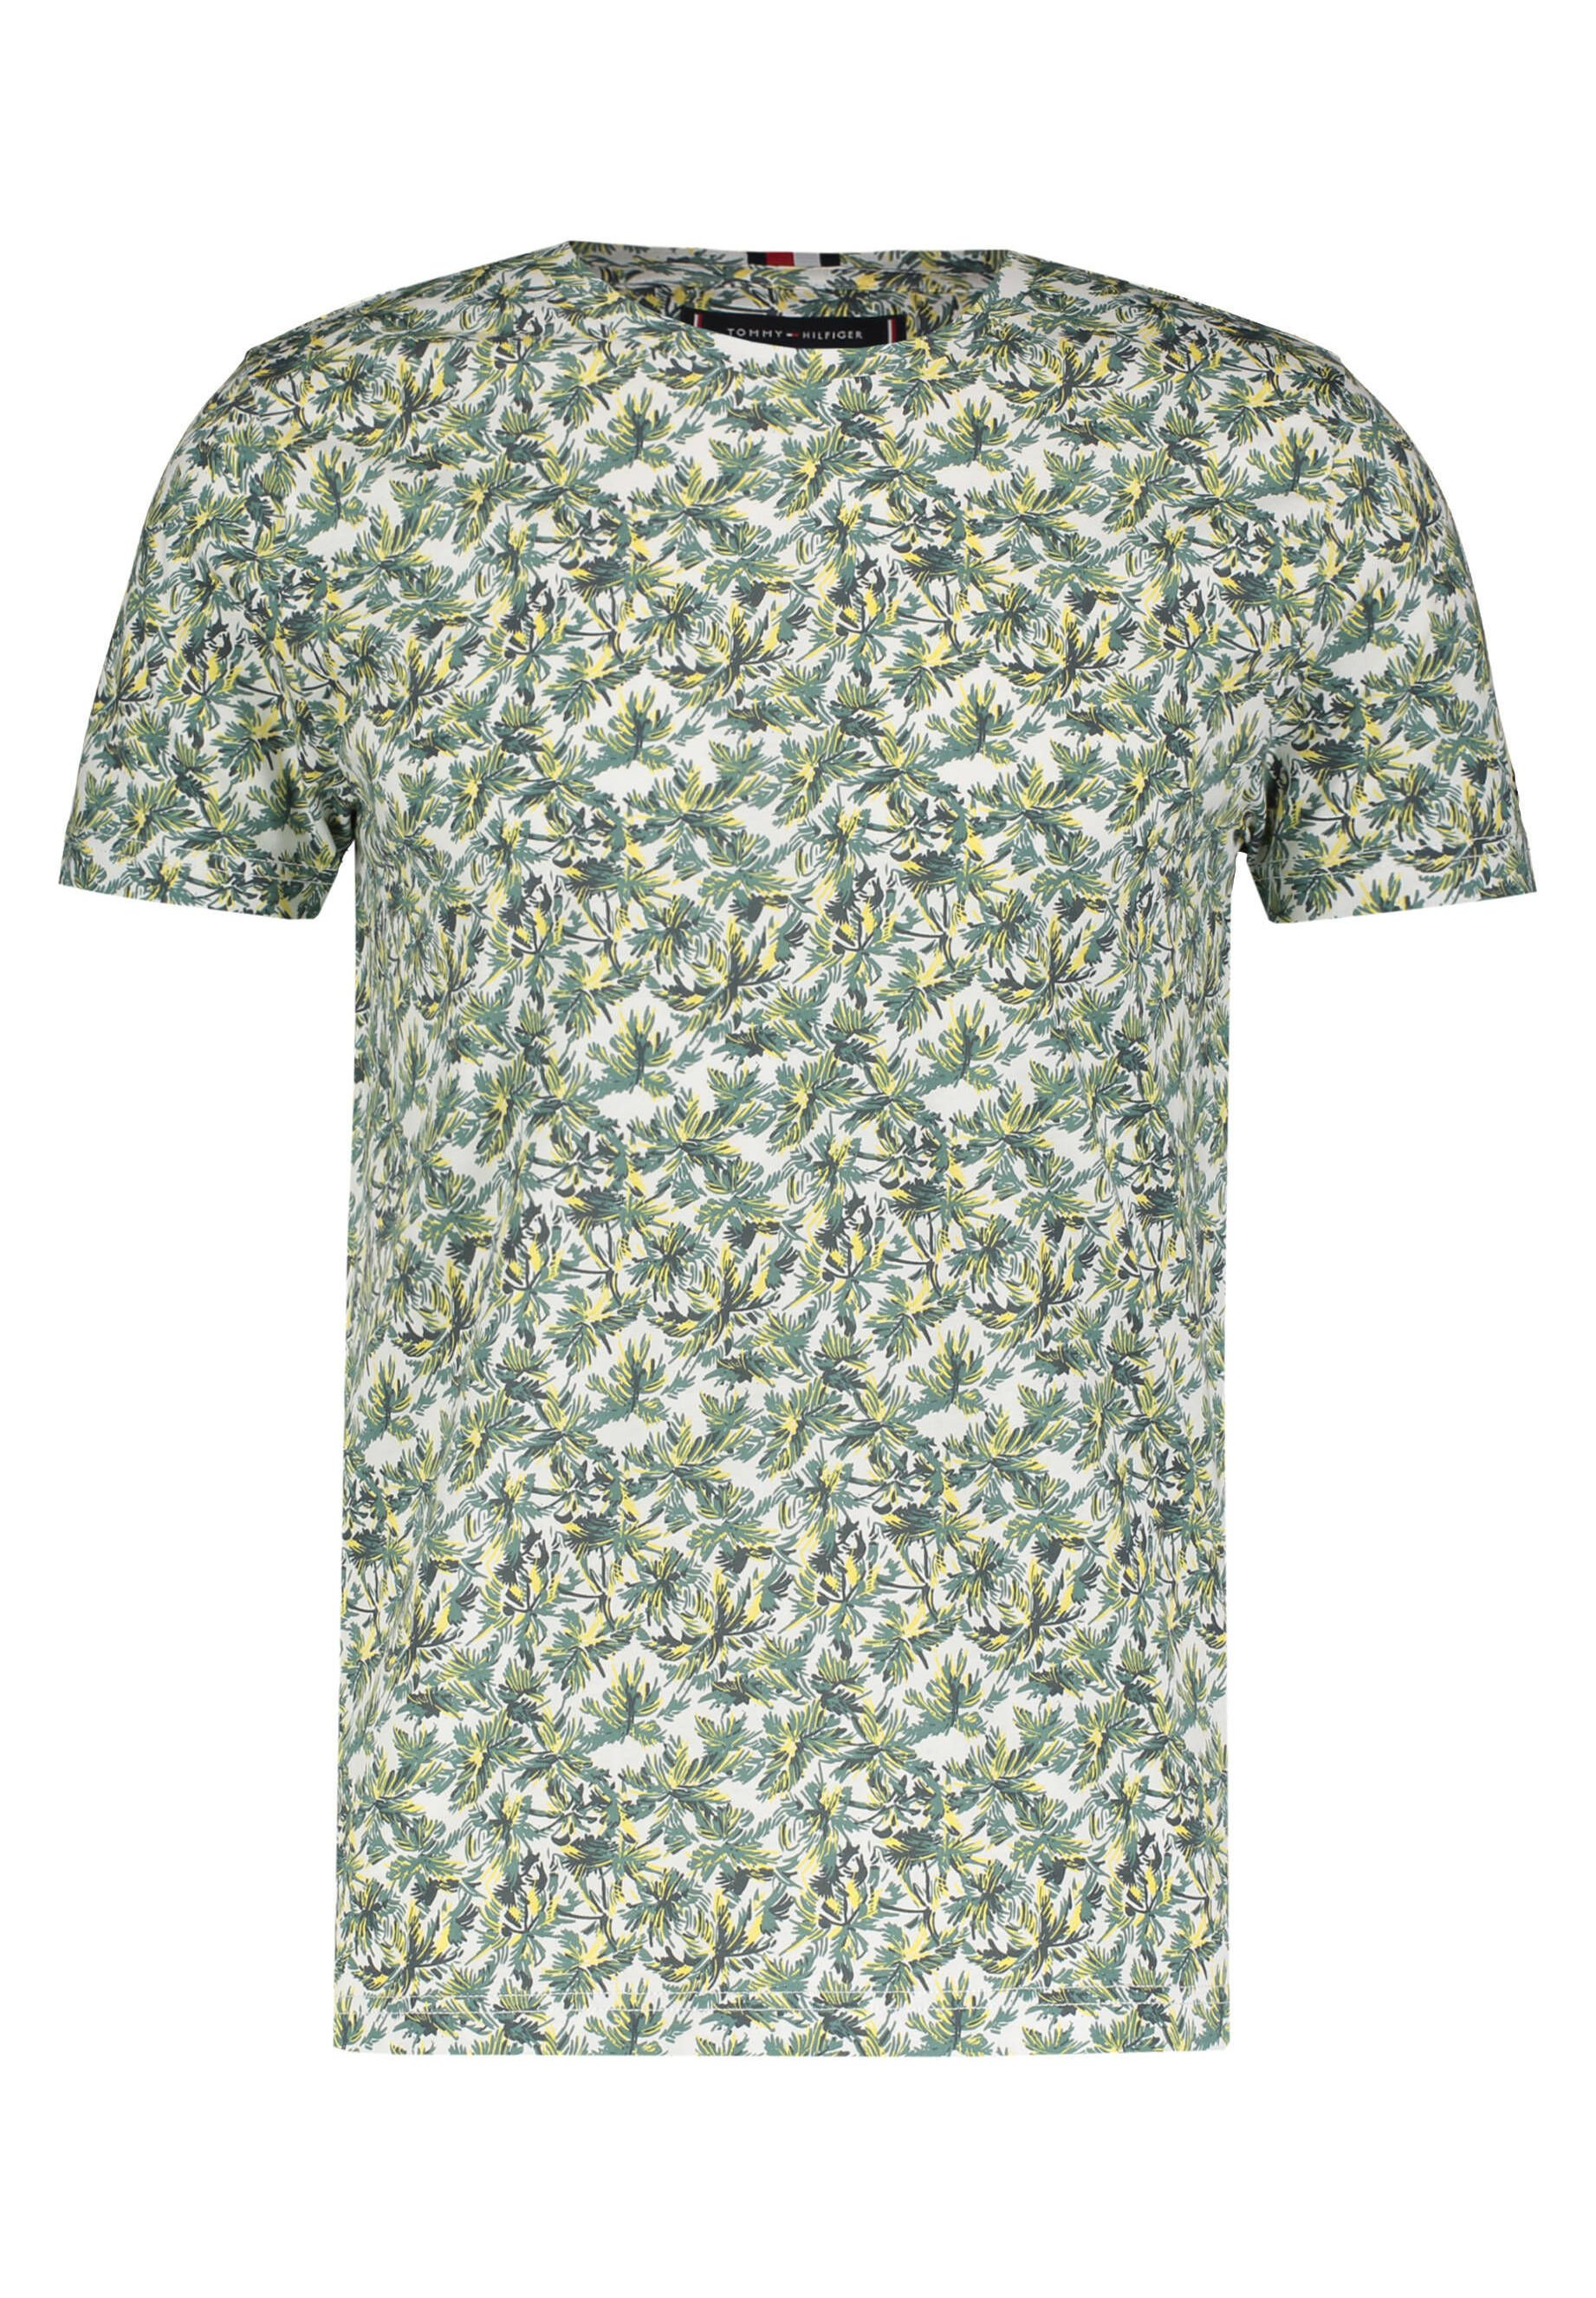 "Tommy Hilfiger TOMMY HILFIGER HERREN T-SHIRT ""ALLOVER LEAF"" - Print T-shirt - weiss (10)"